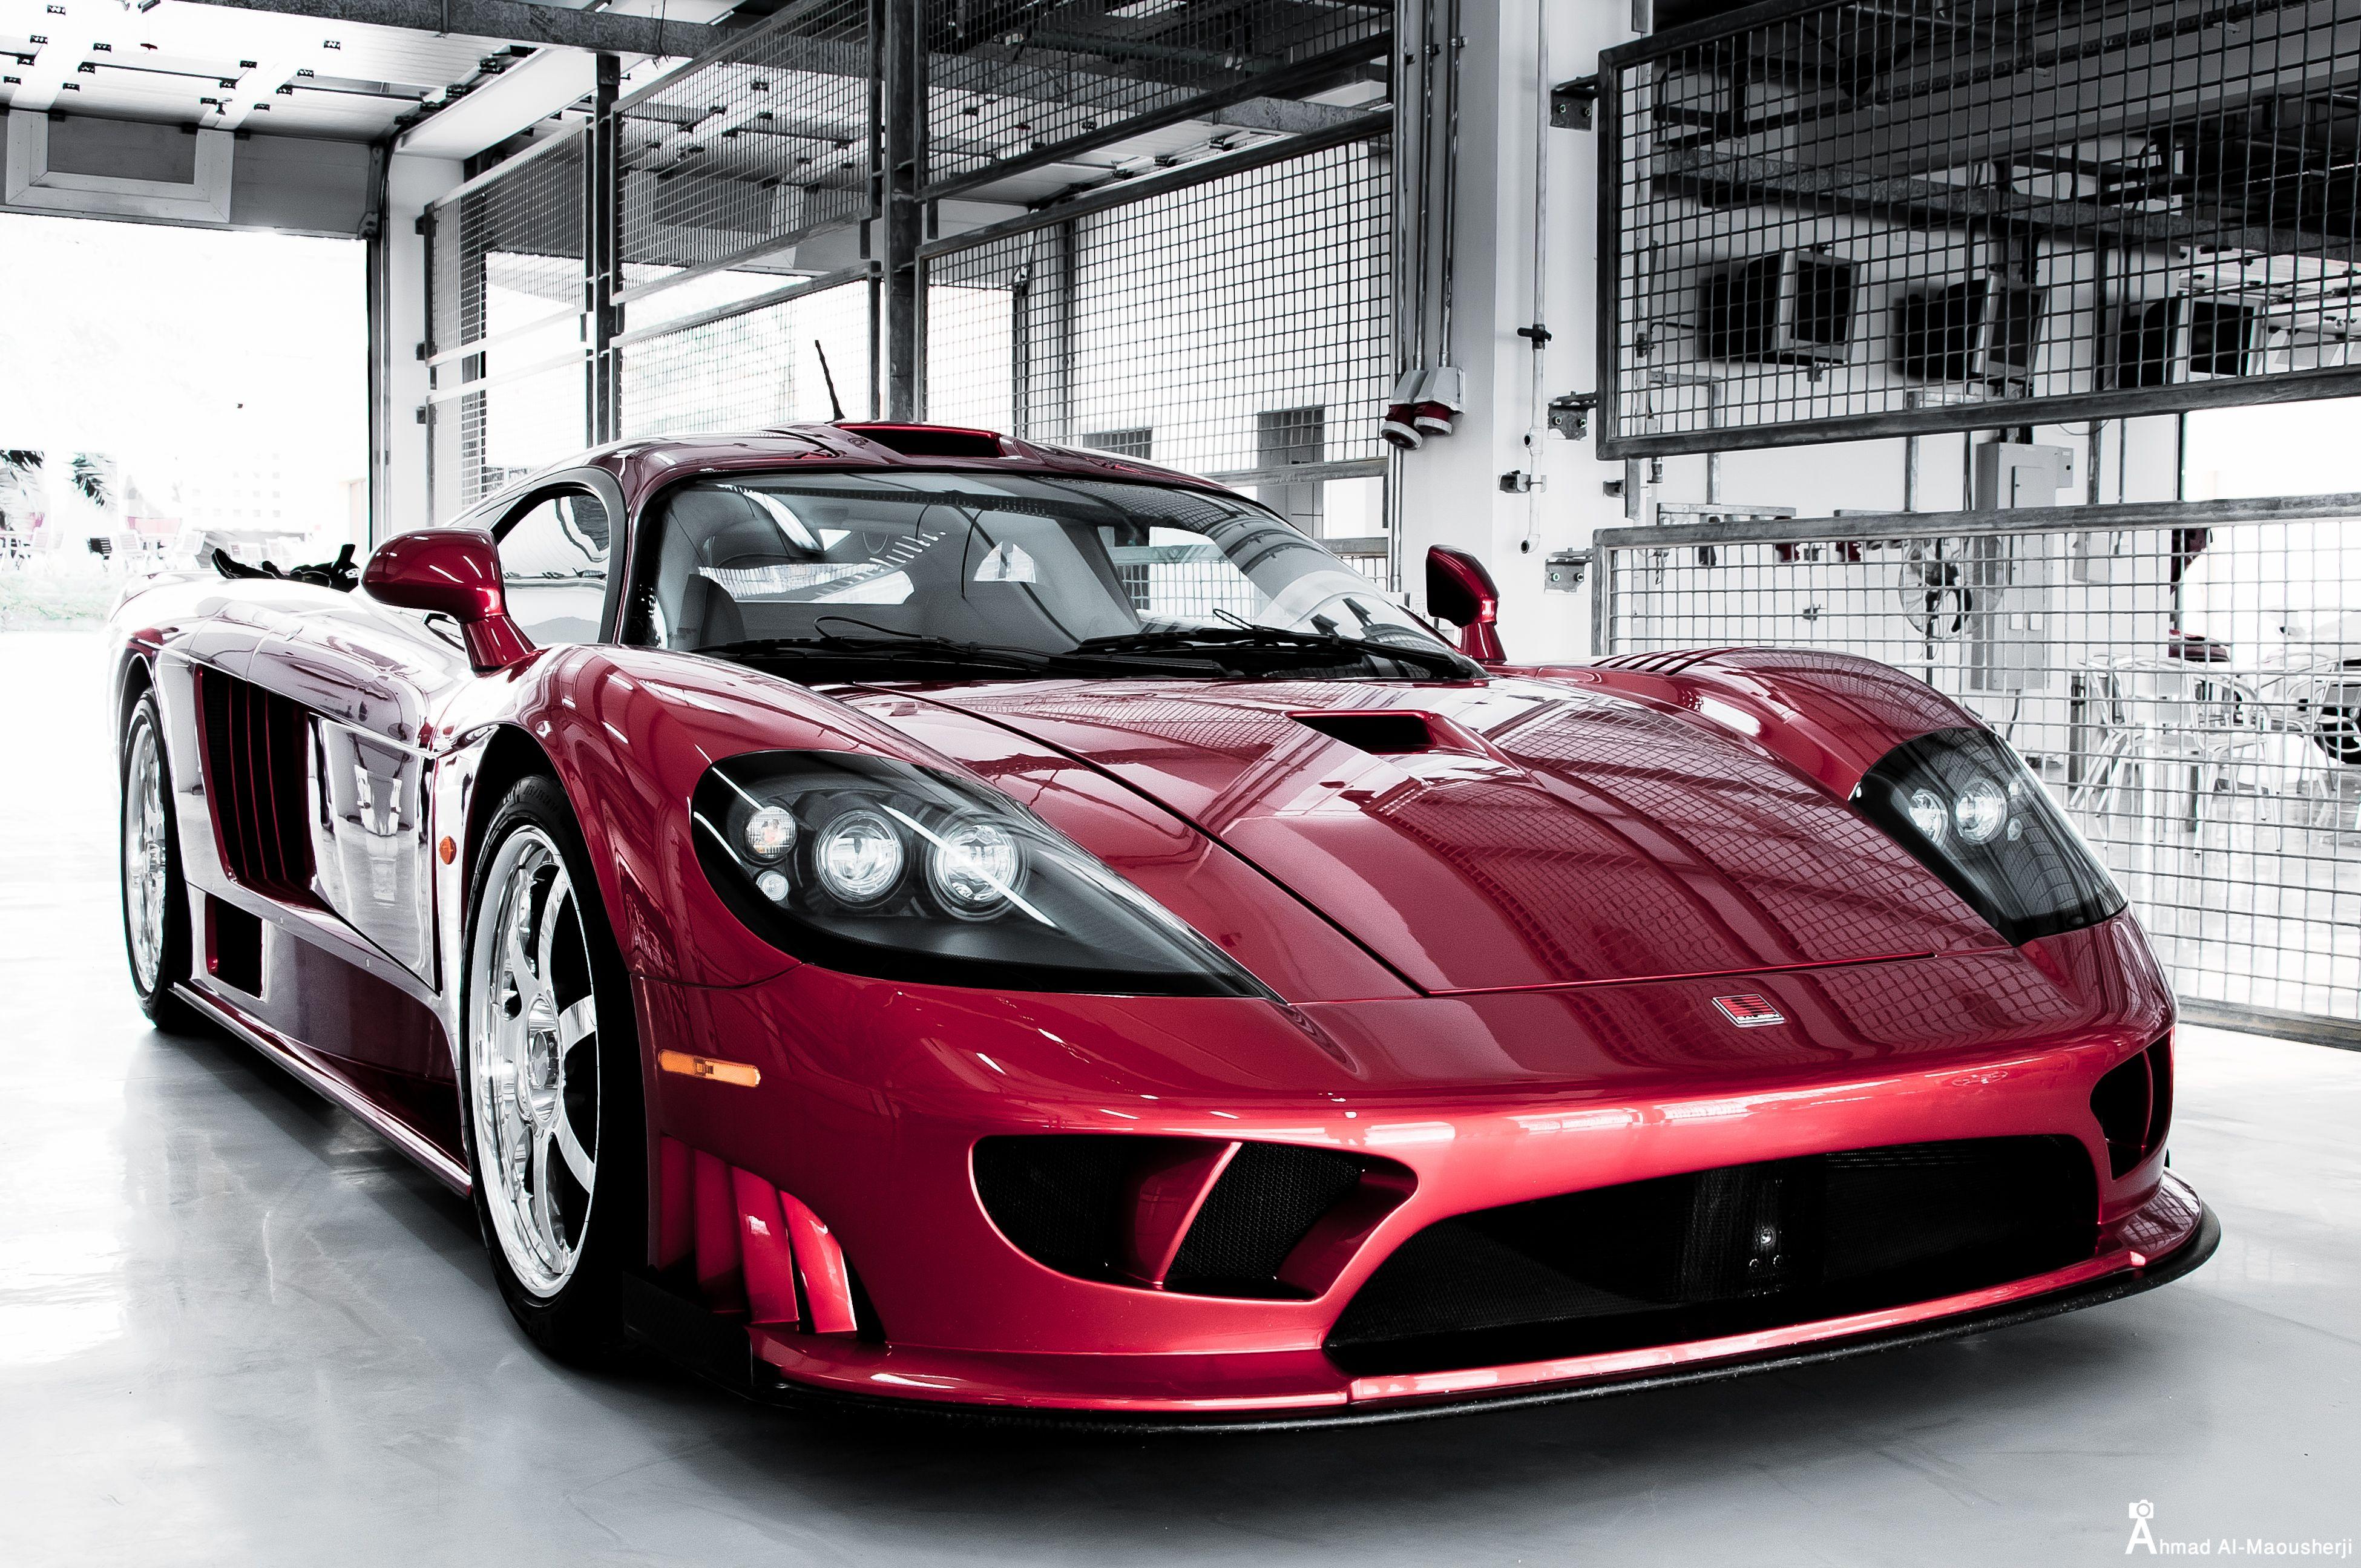 Saleen S7 Super American Car Dream Cars Amazing Cars Sports Cars Luxury